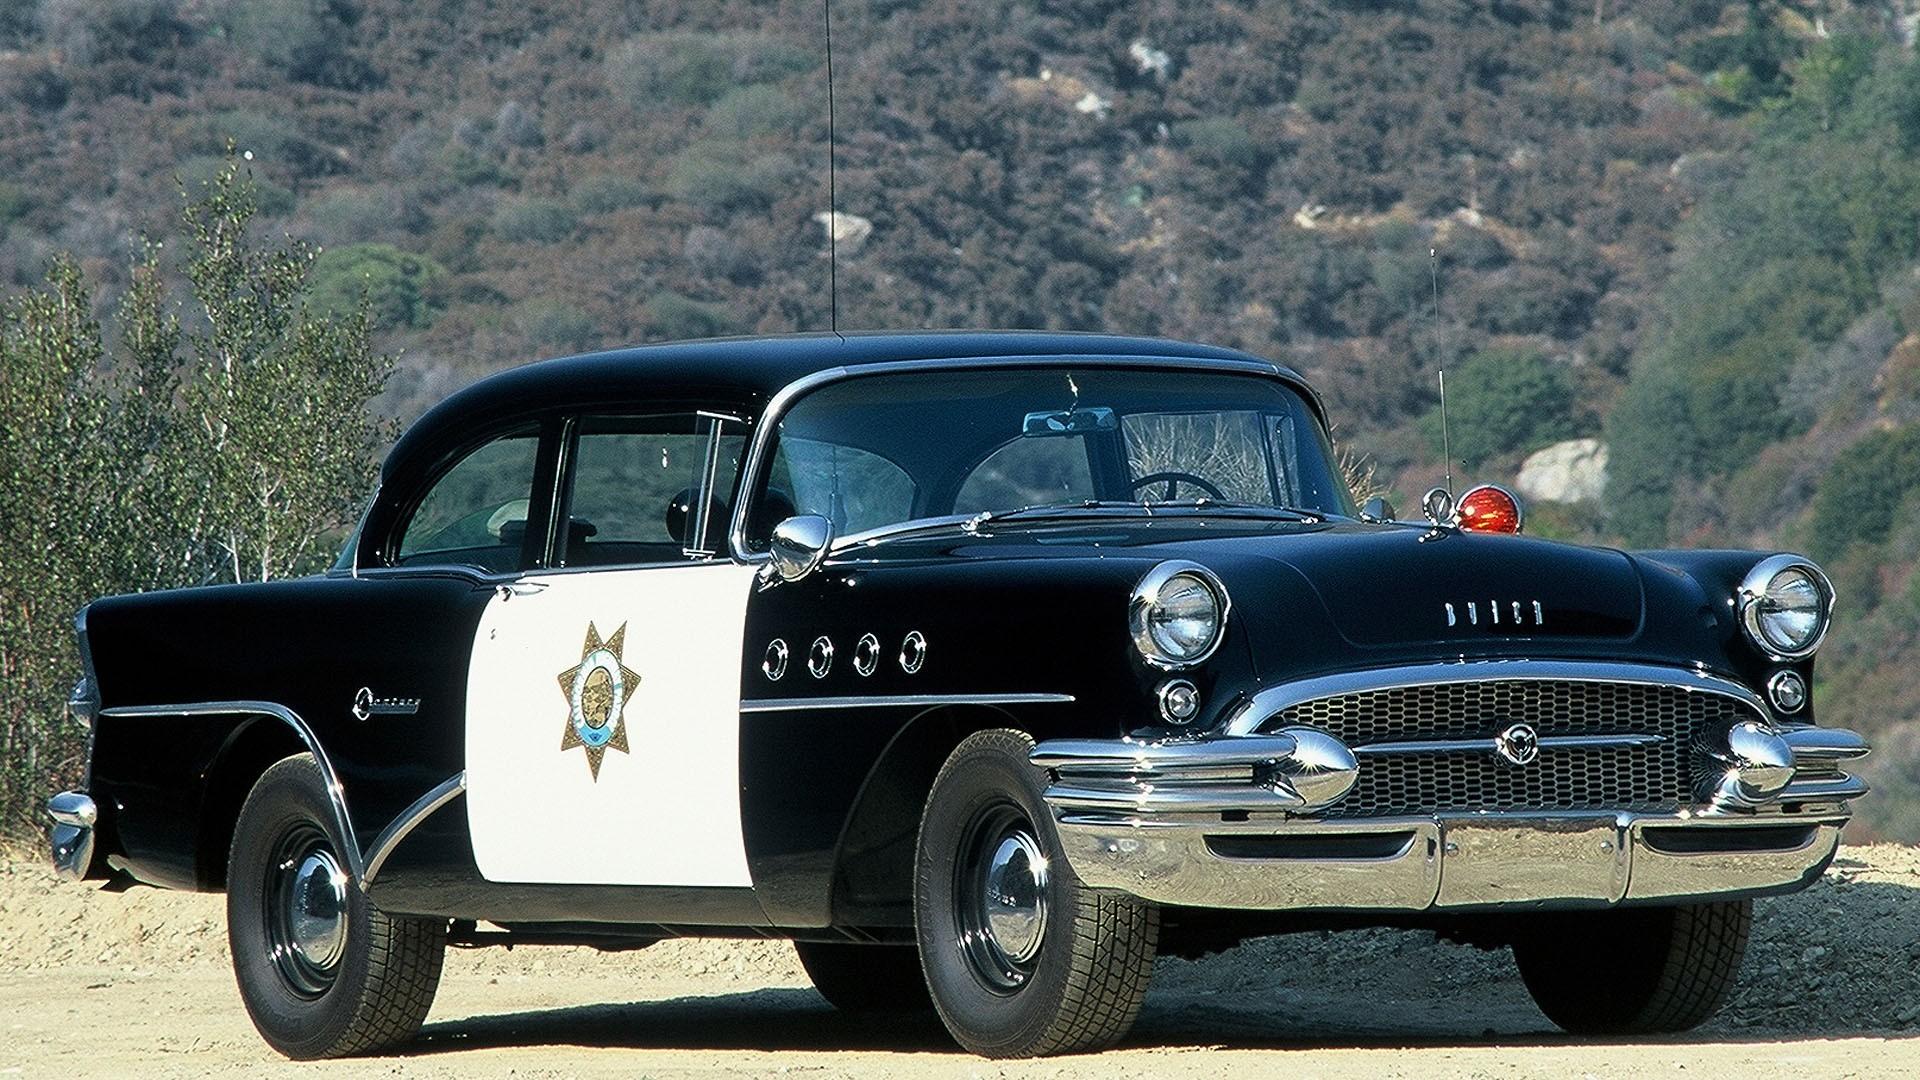 Cars Police Wallpaper Cars, Police